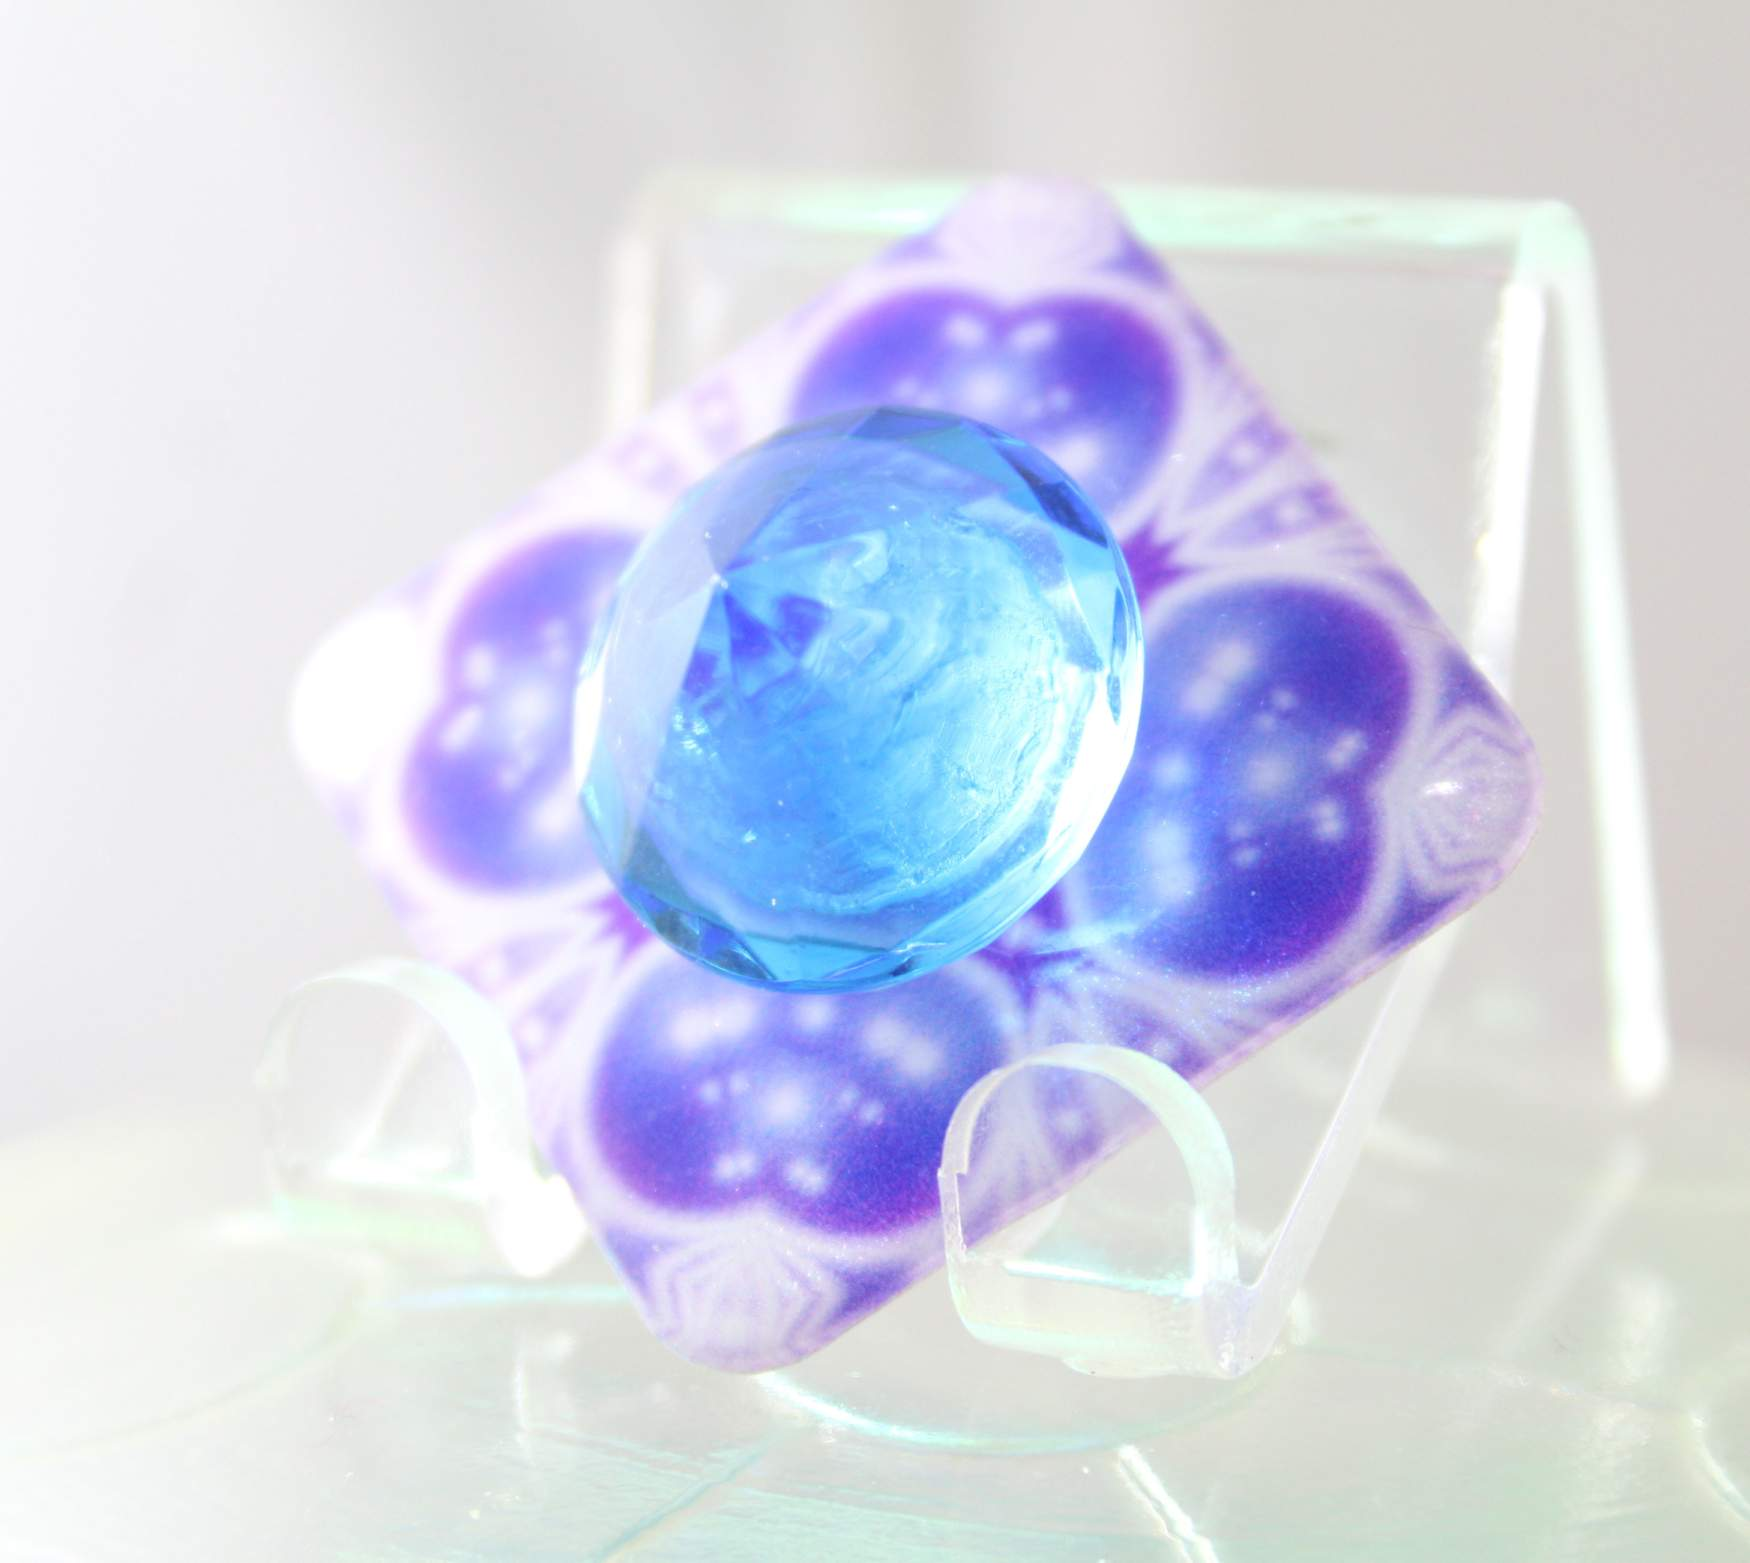 vanguard-v02-singleflat-blue03